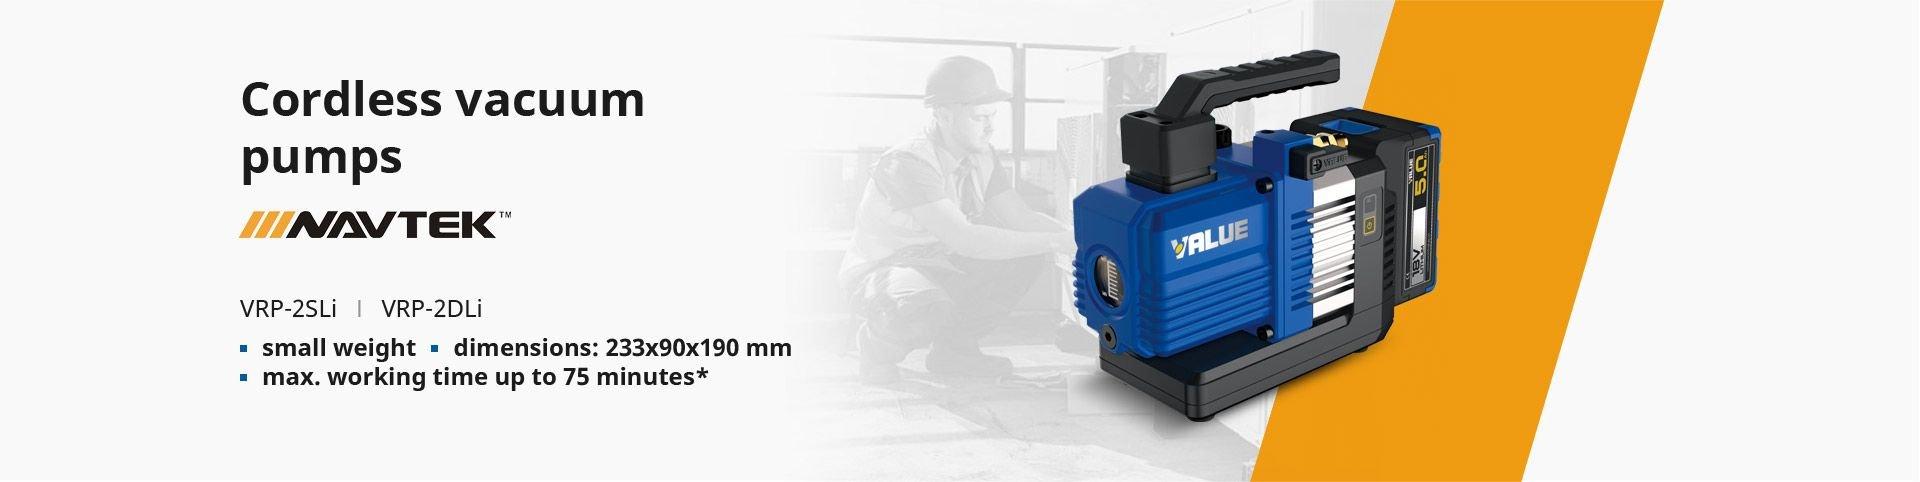 Cordless vacuum pumps